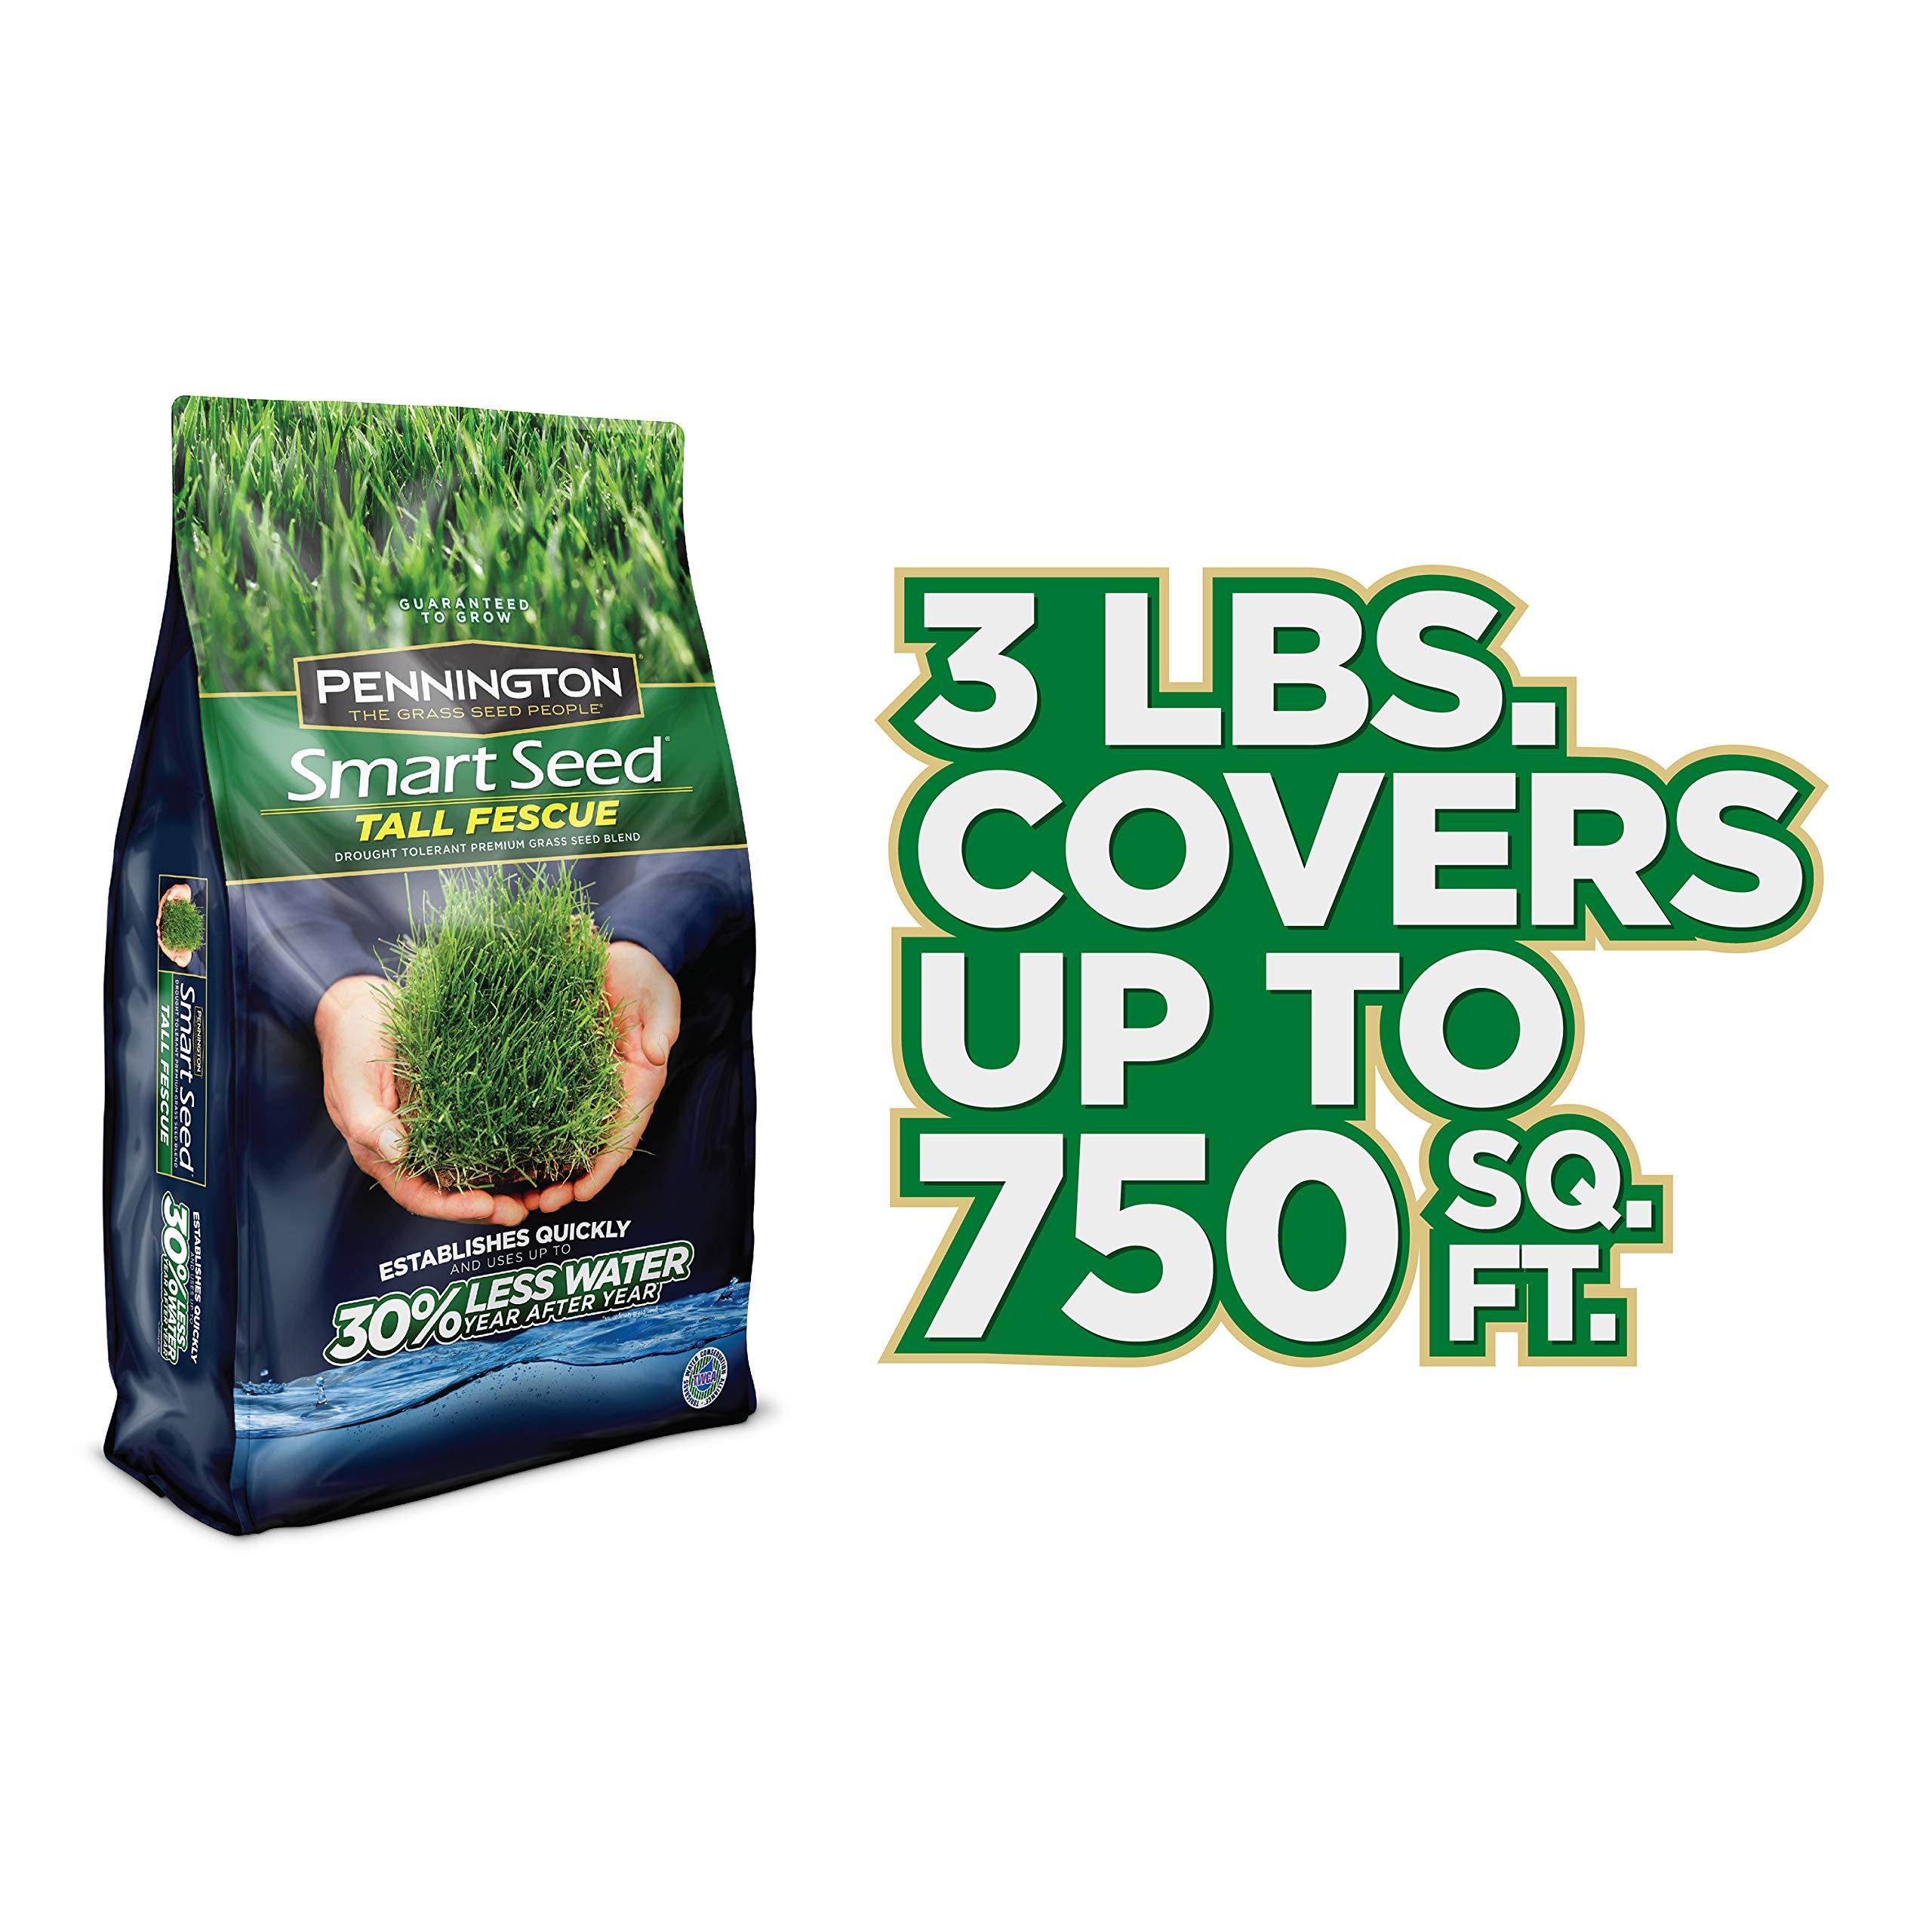 Pennington 100526675 Smart Seed Tall Fescue Grass Seed, 3 LB by Pennington (Image #6)